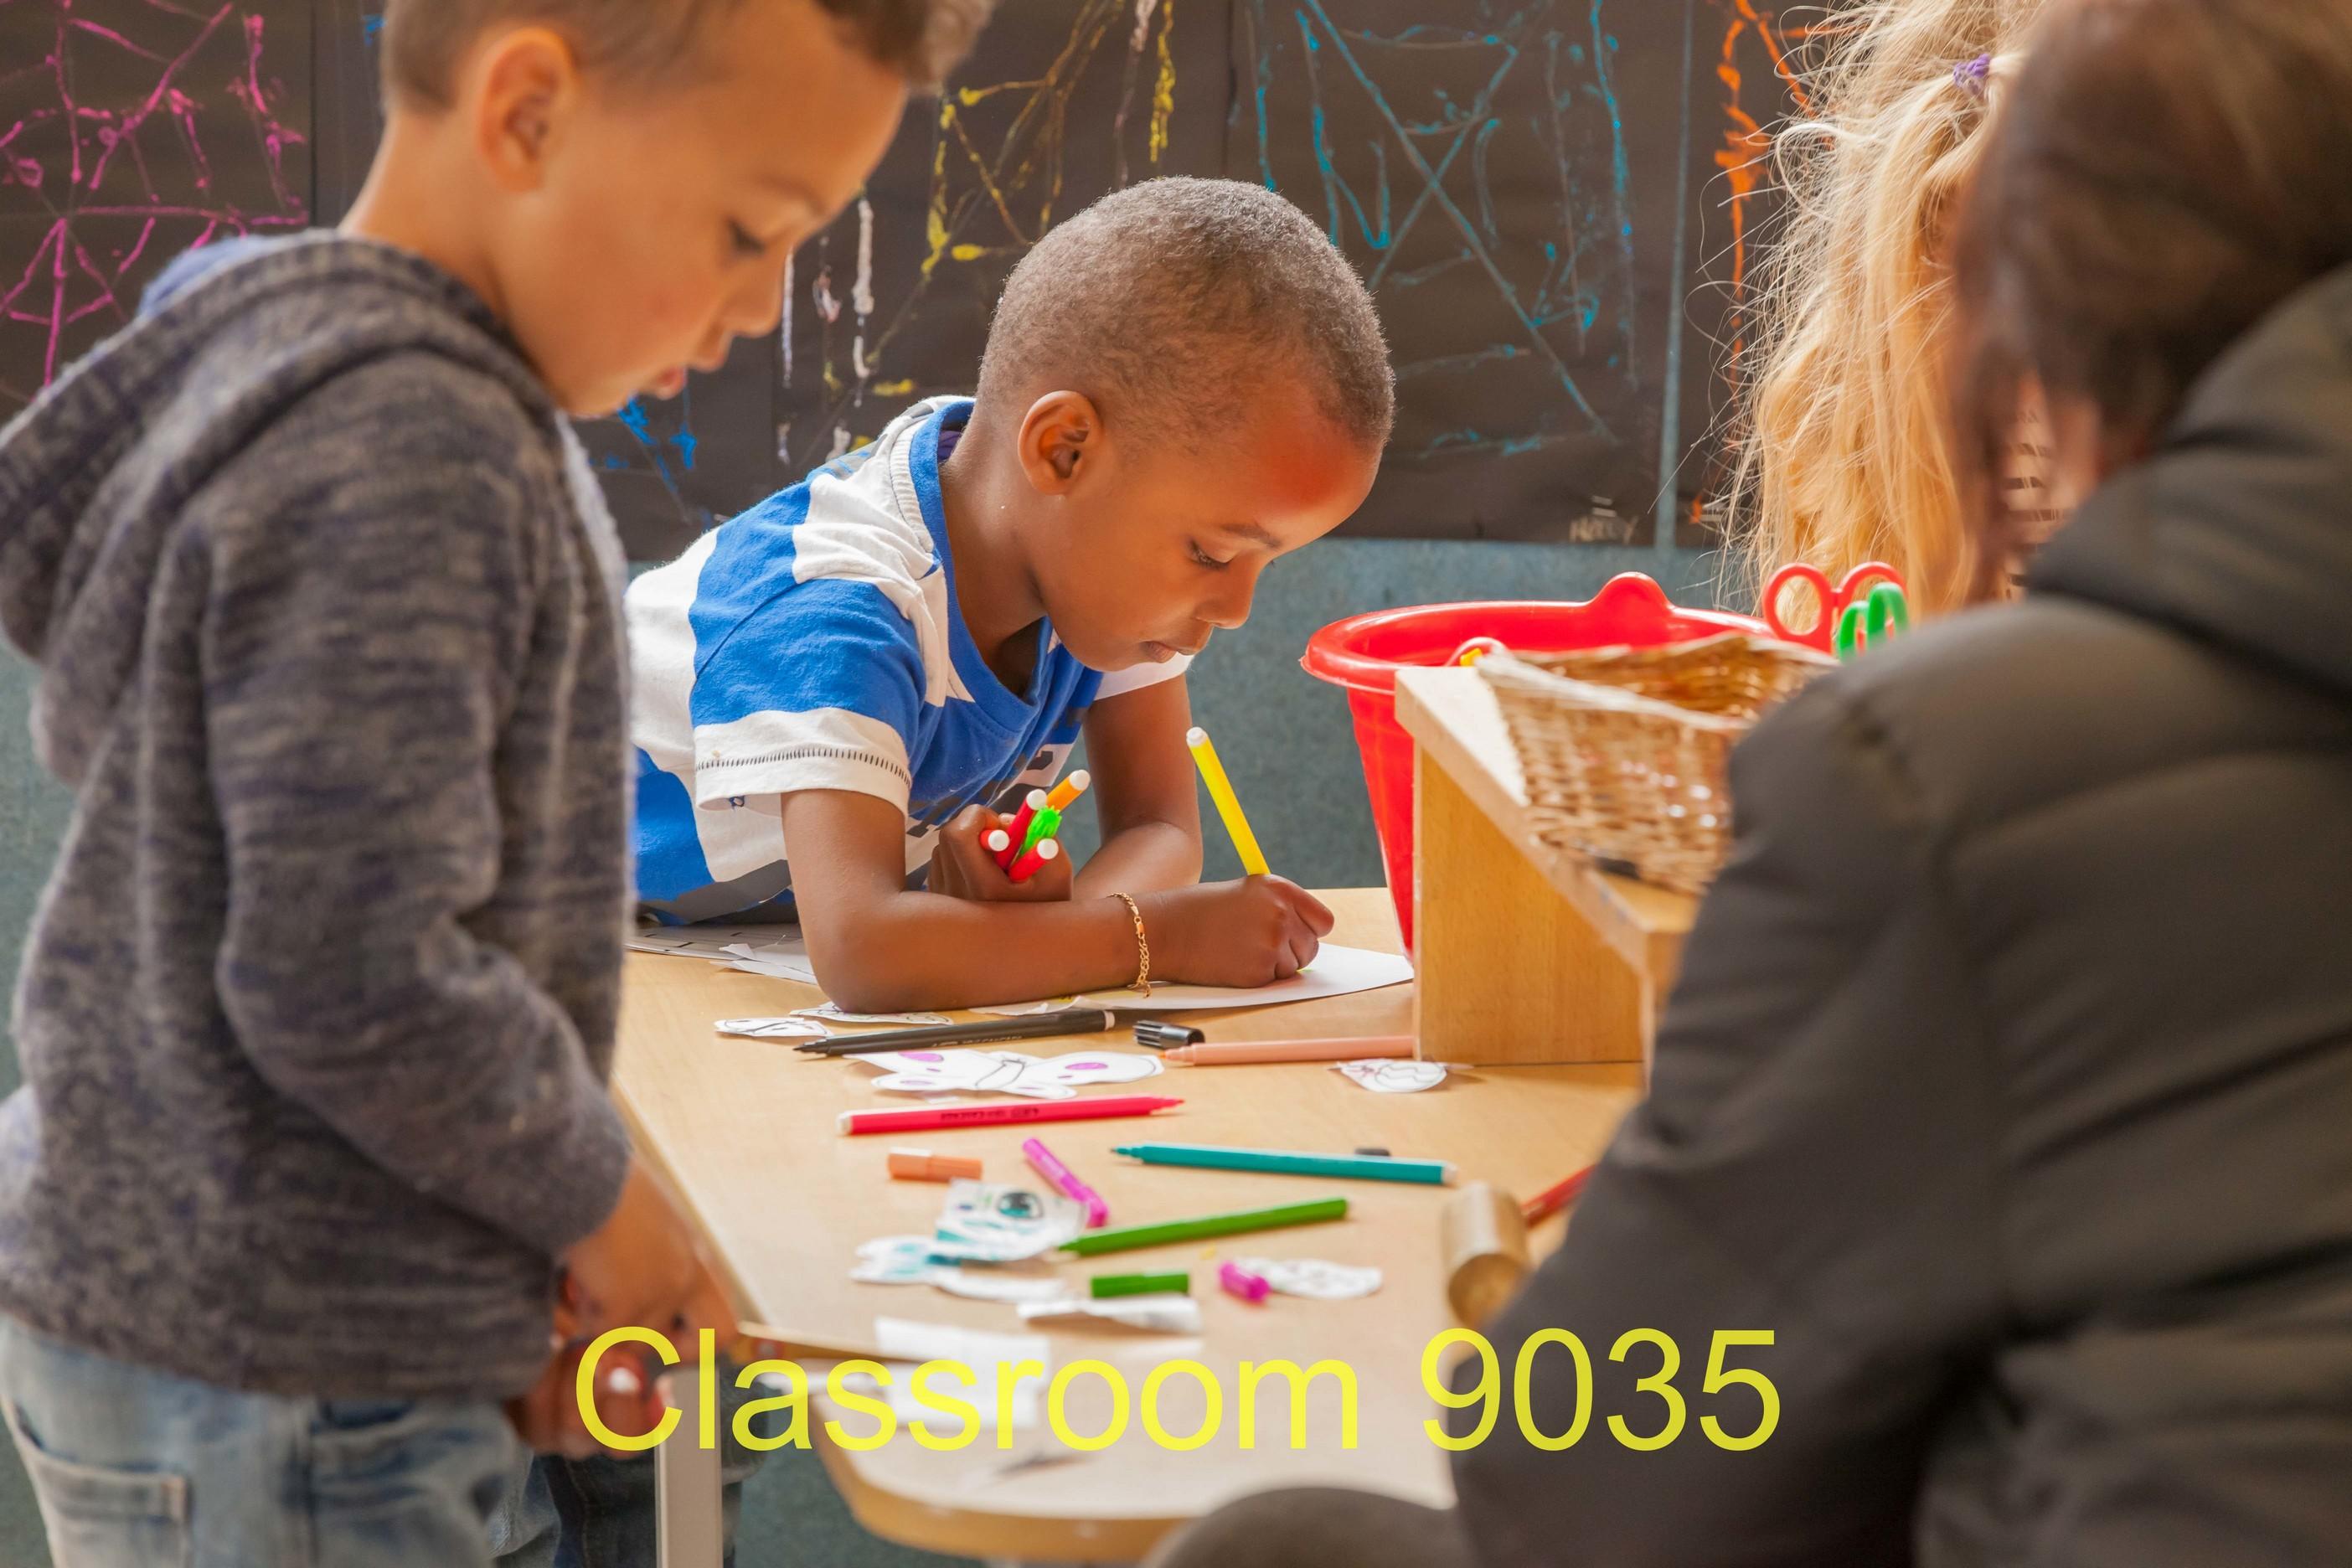 Classroom 9035